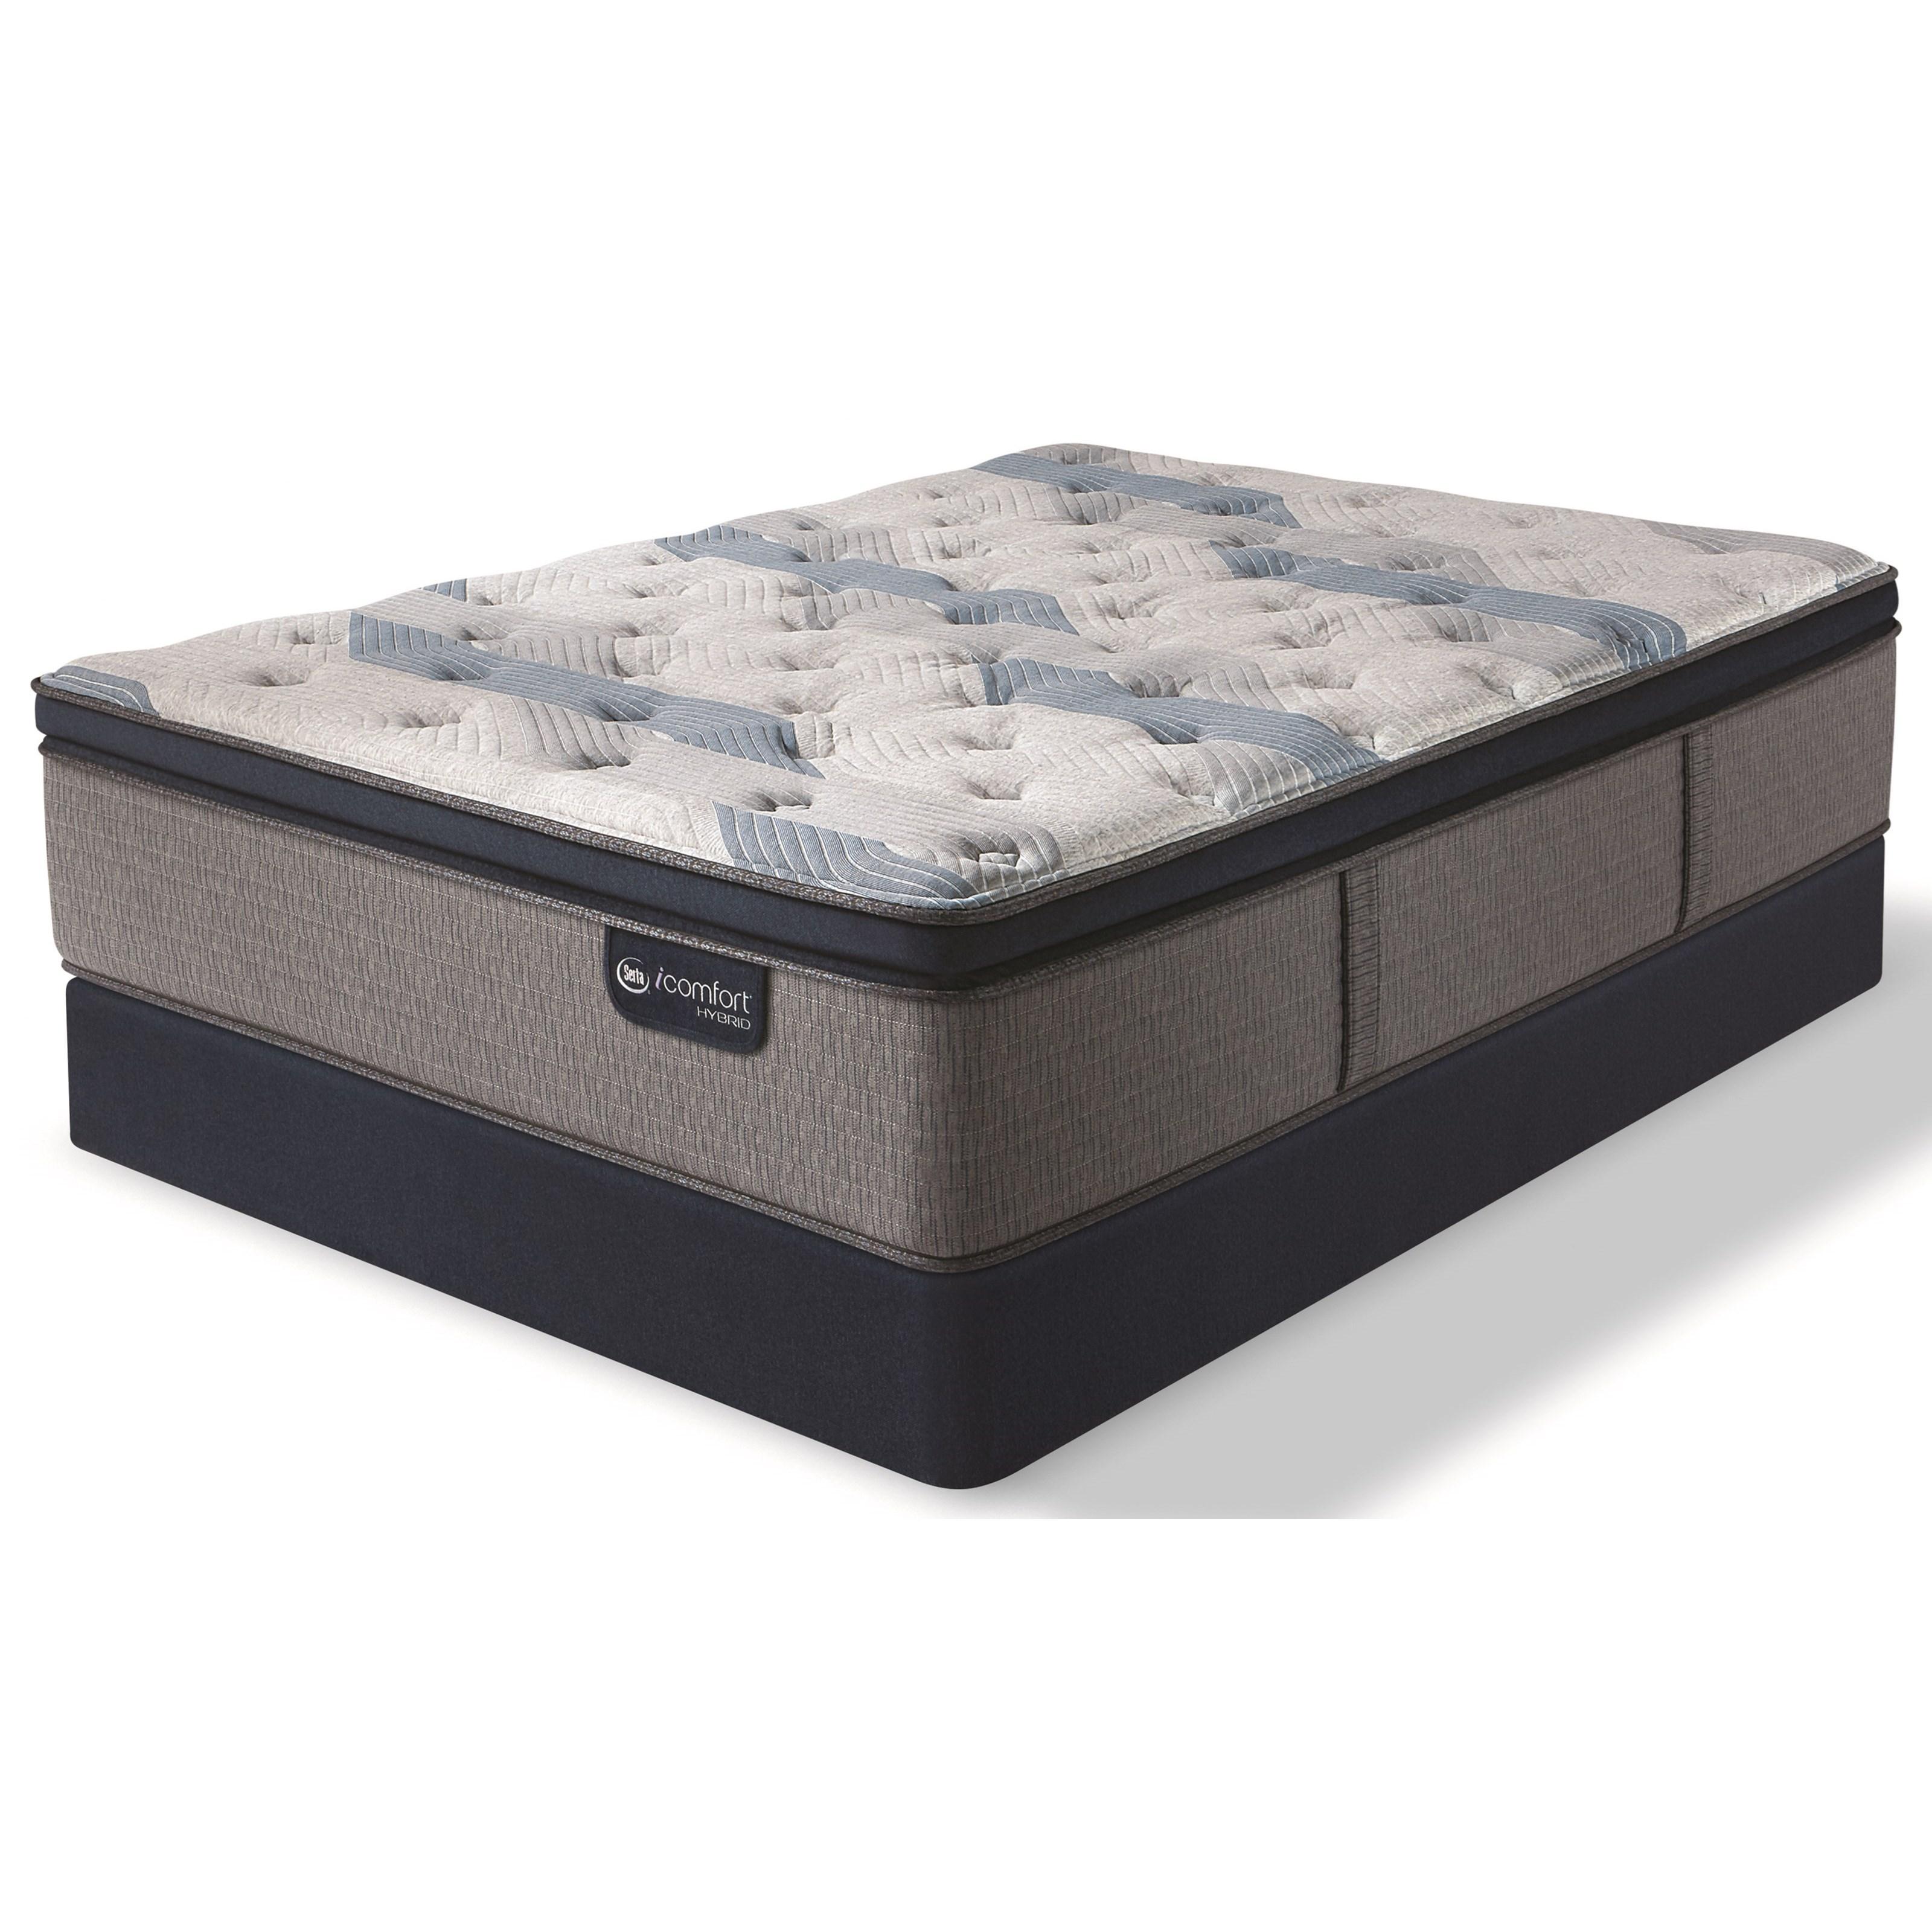 Serta iComfort Blue Fusion 300 Queen Plush Pillow Top